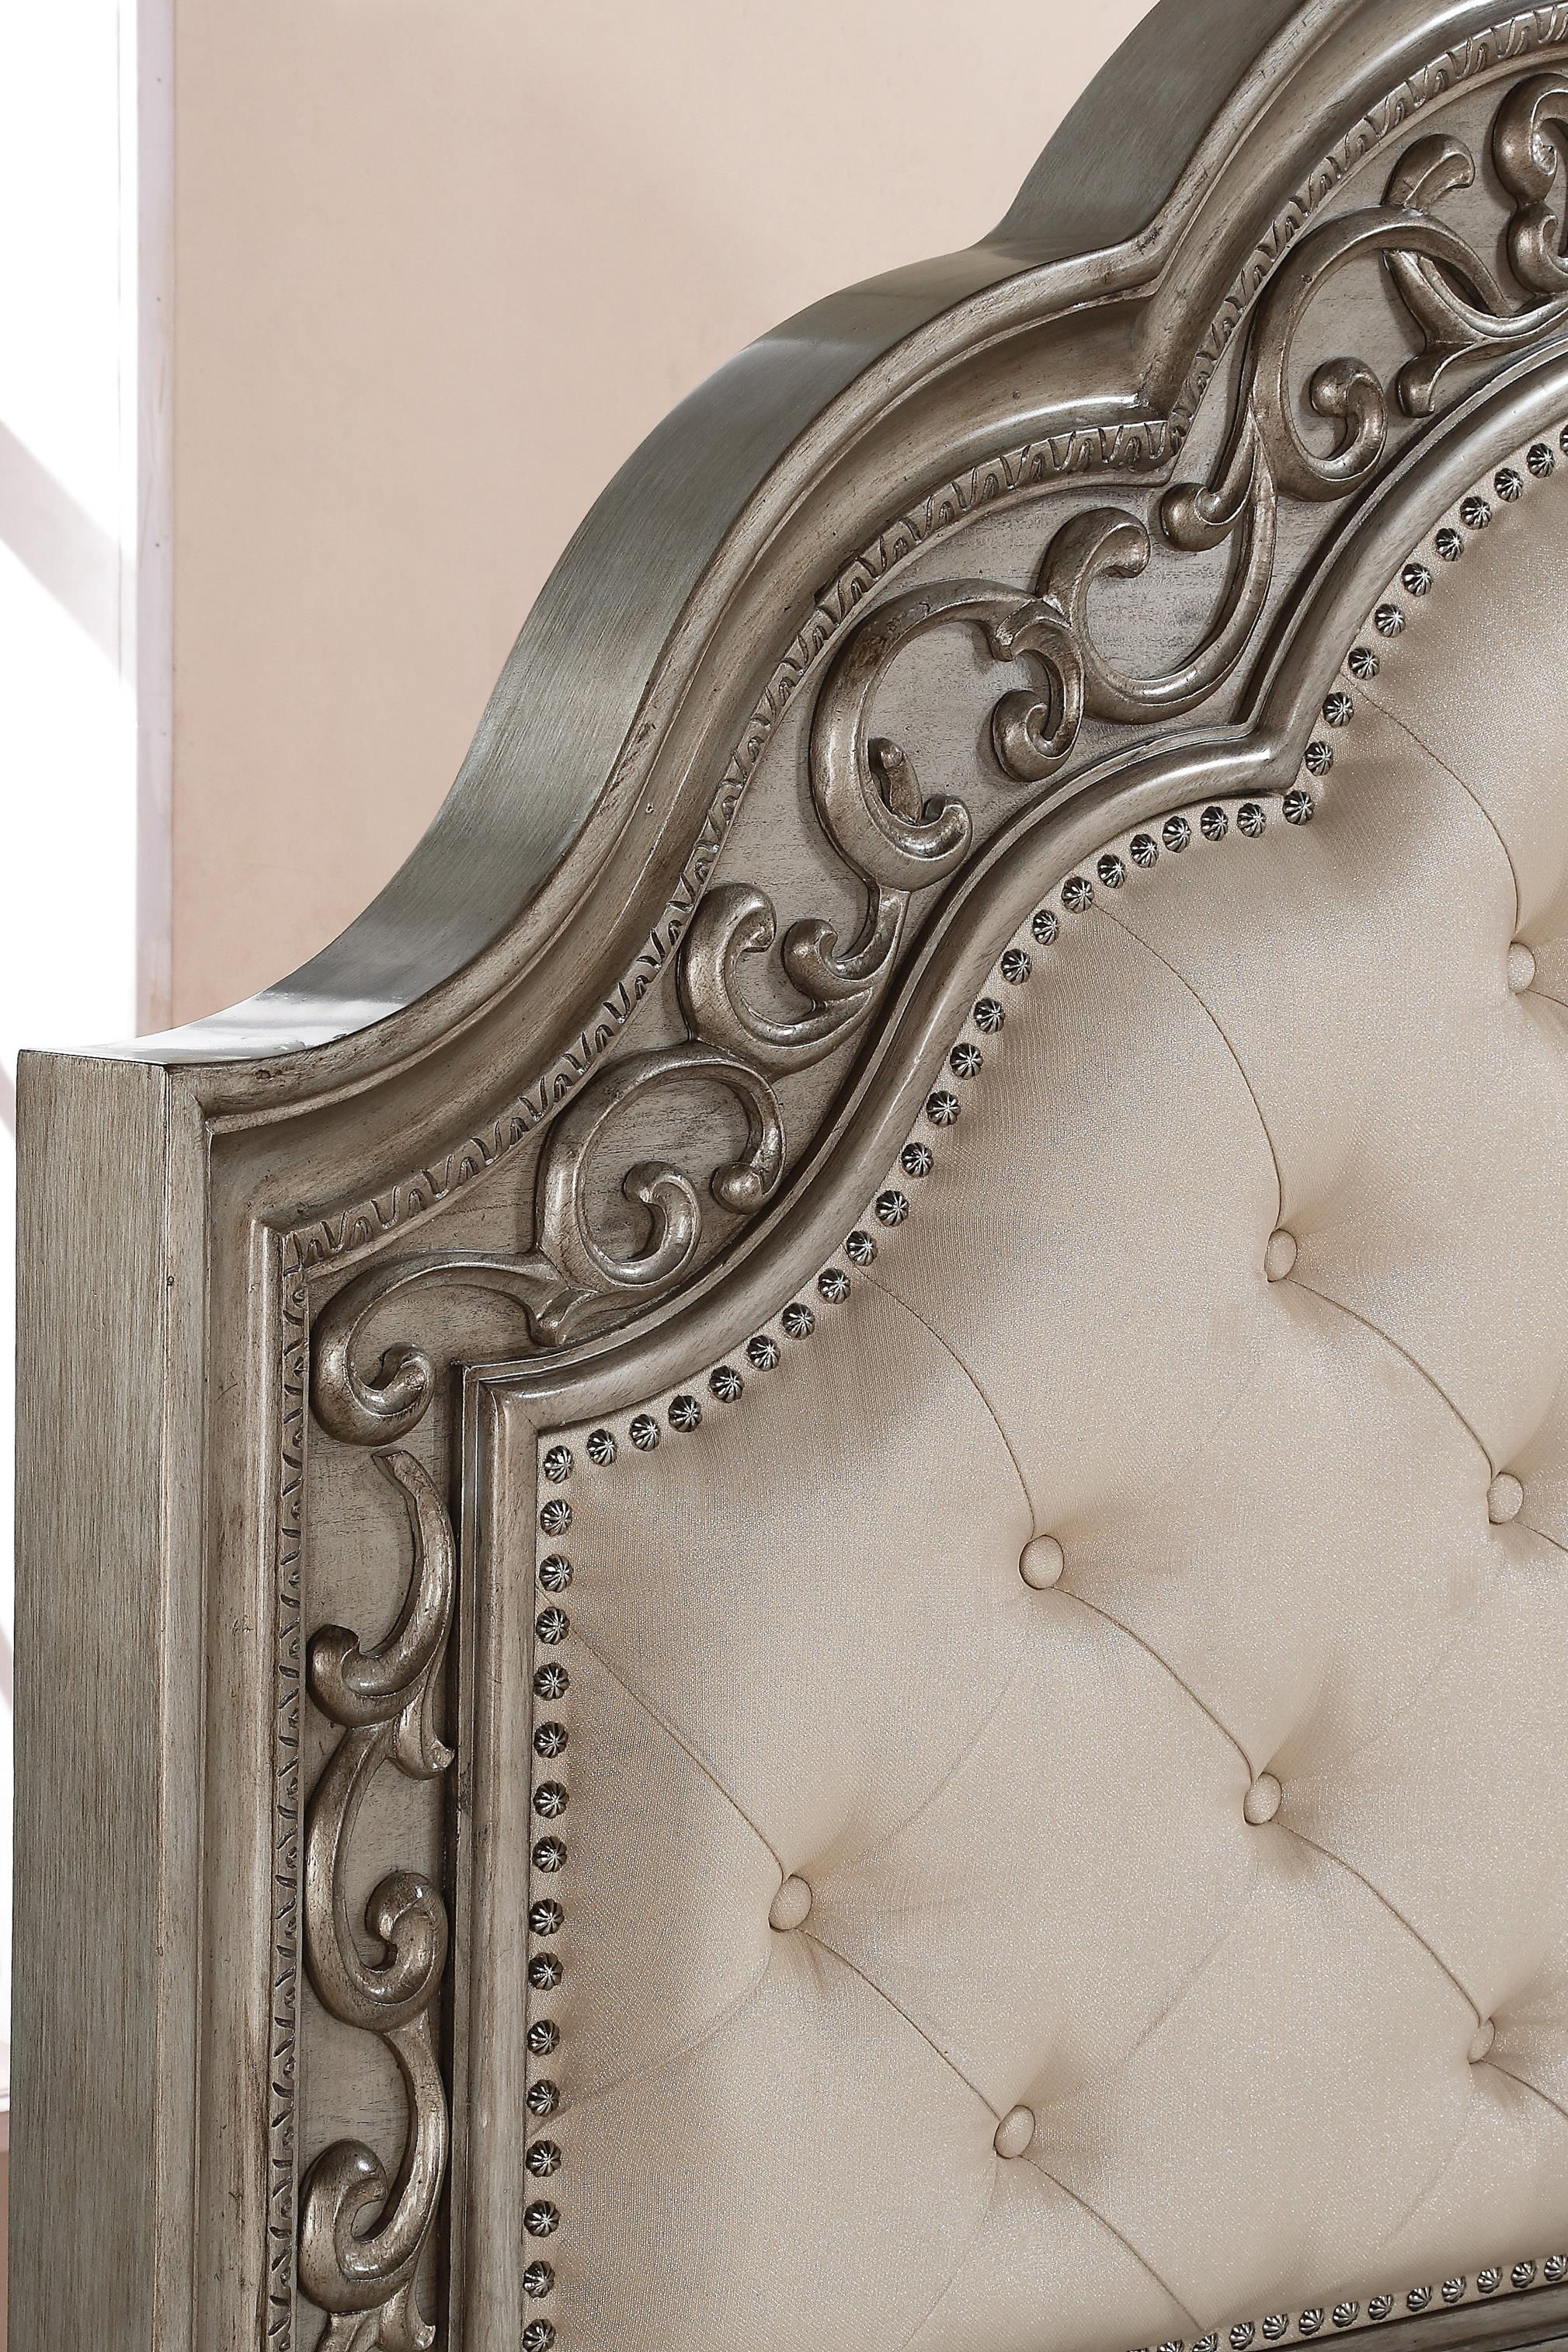 Flexsteel Wynwood Collection San Cristobal Queen Bedroom Group Dubois Furniture Waco Temple Killeen Texas